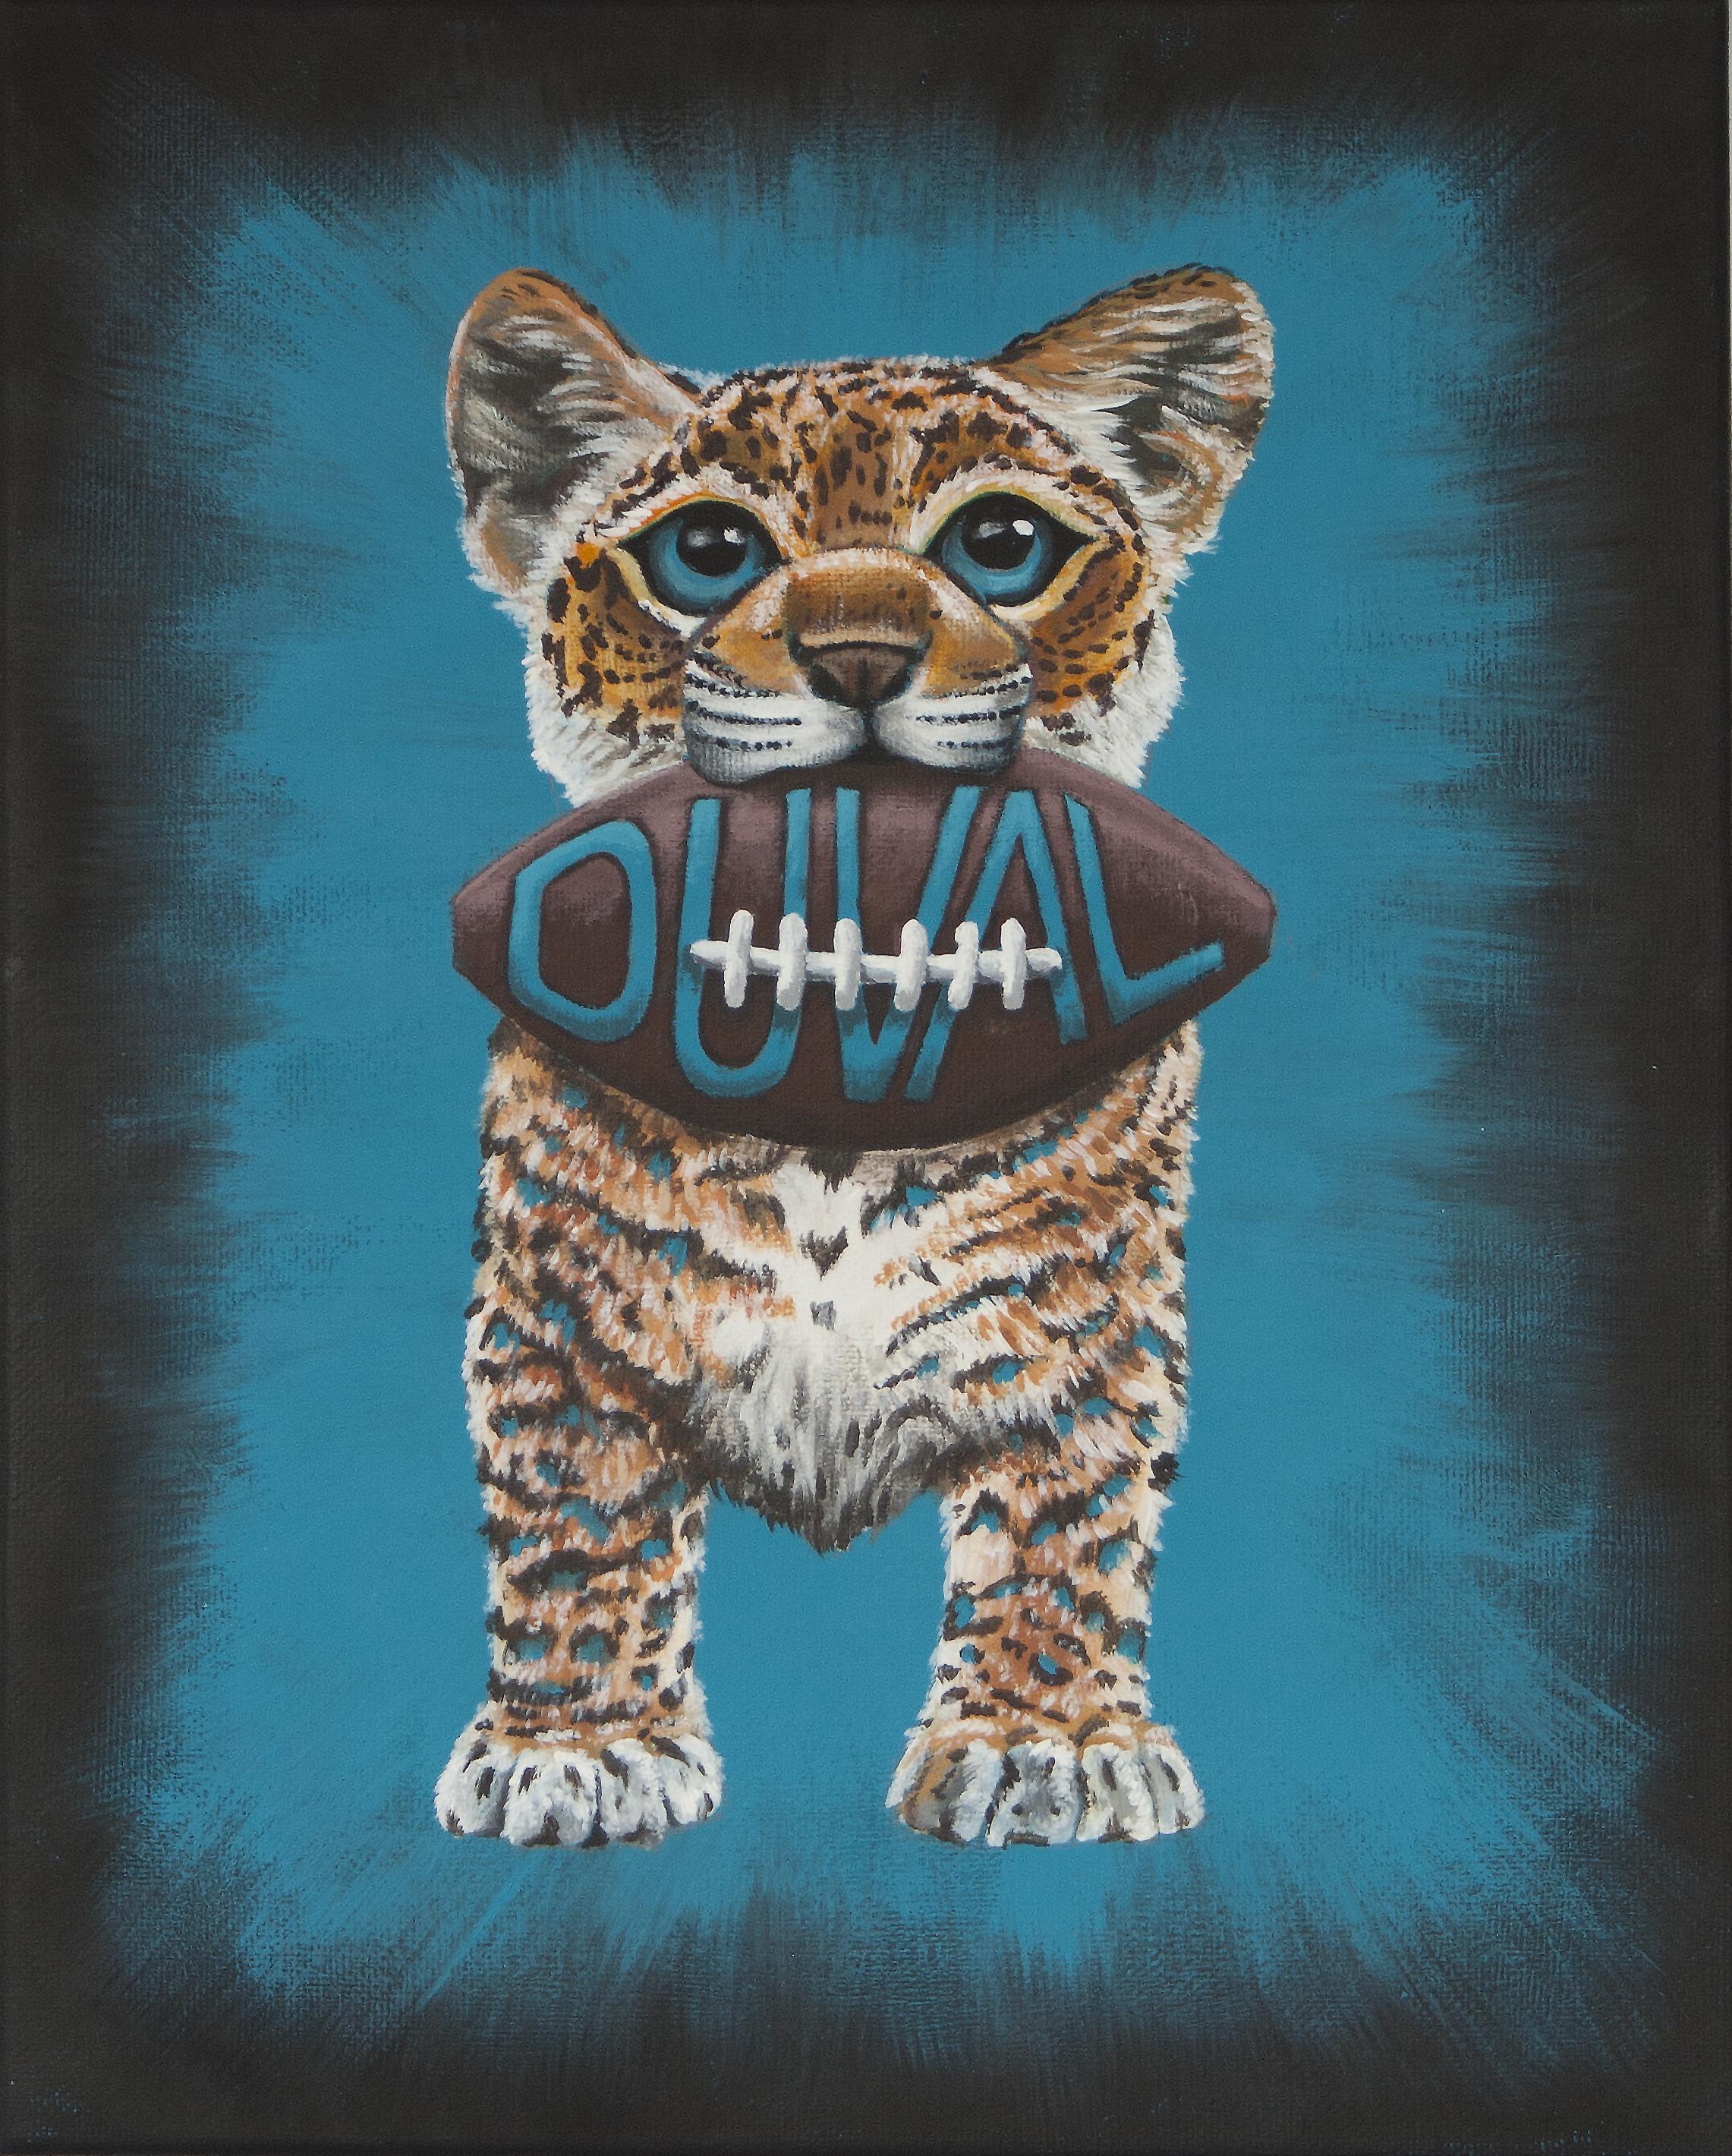 Jax_Jaguars.jpg